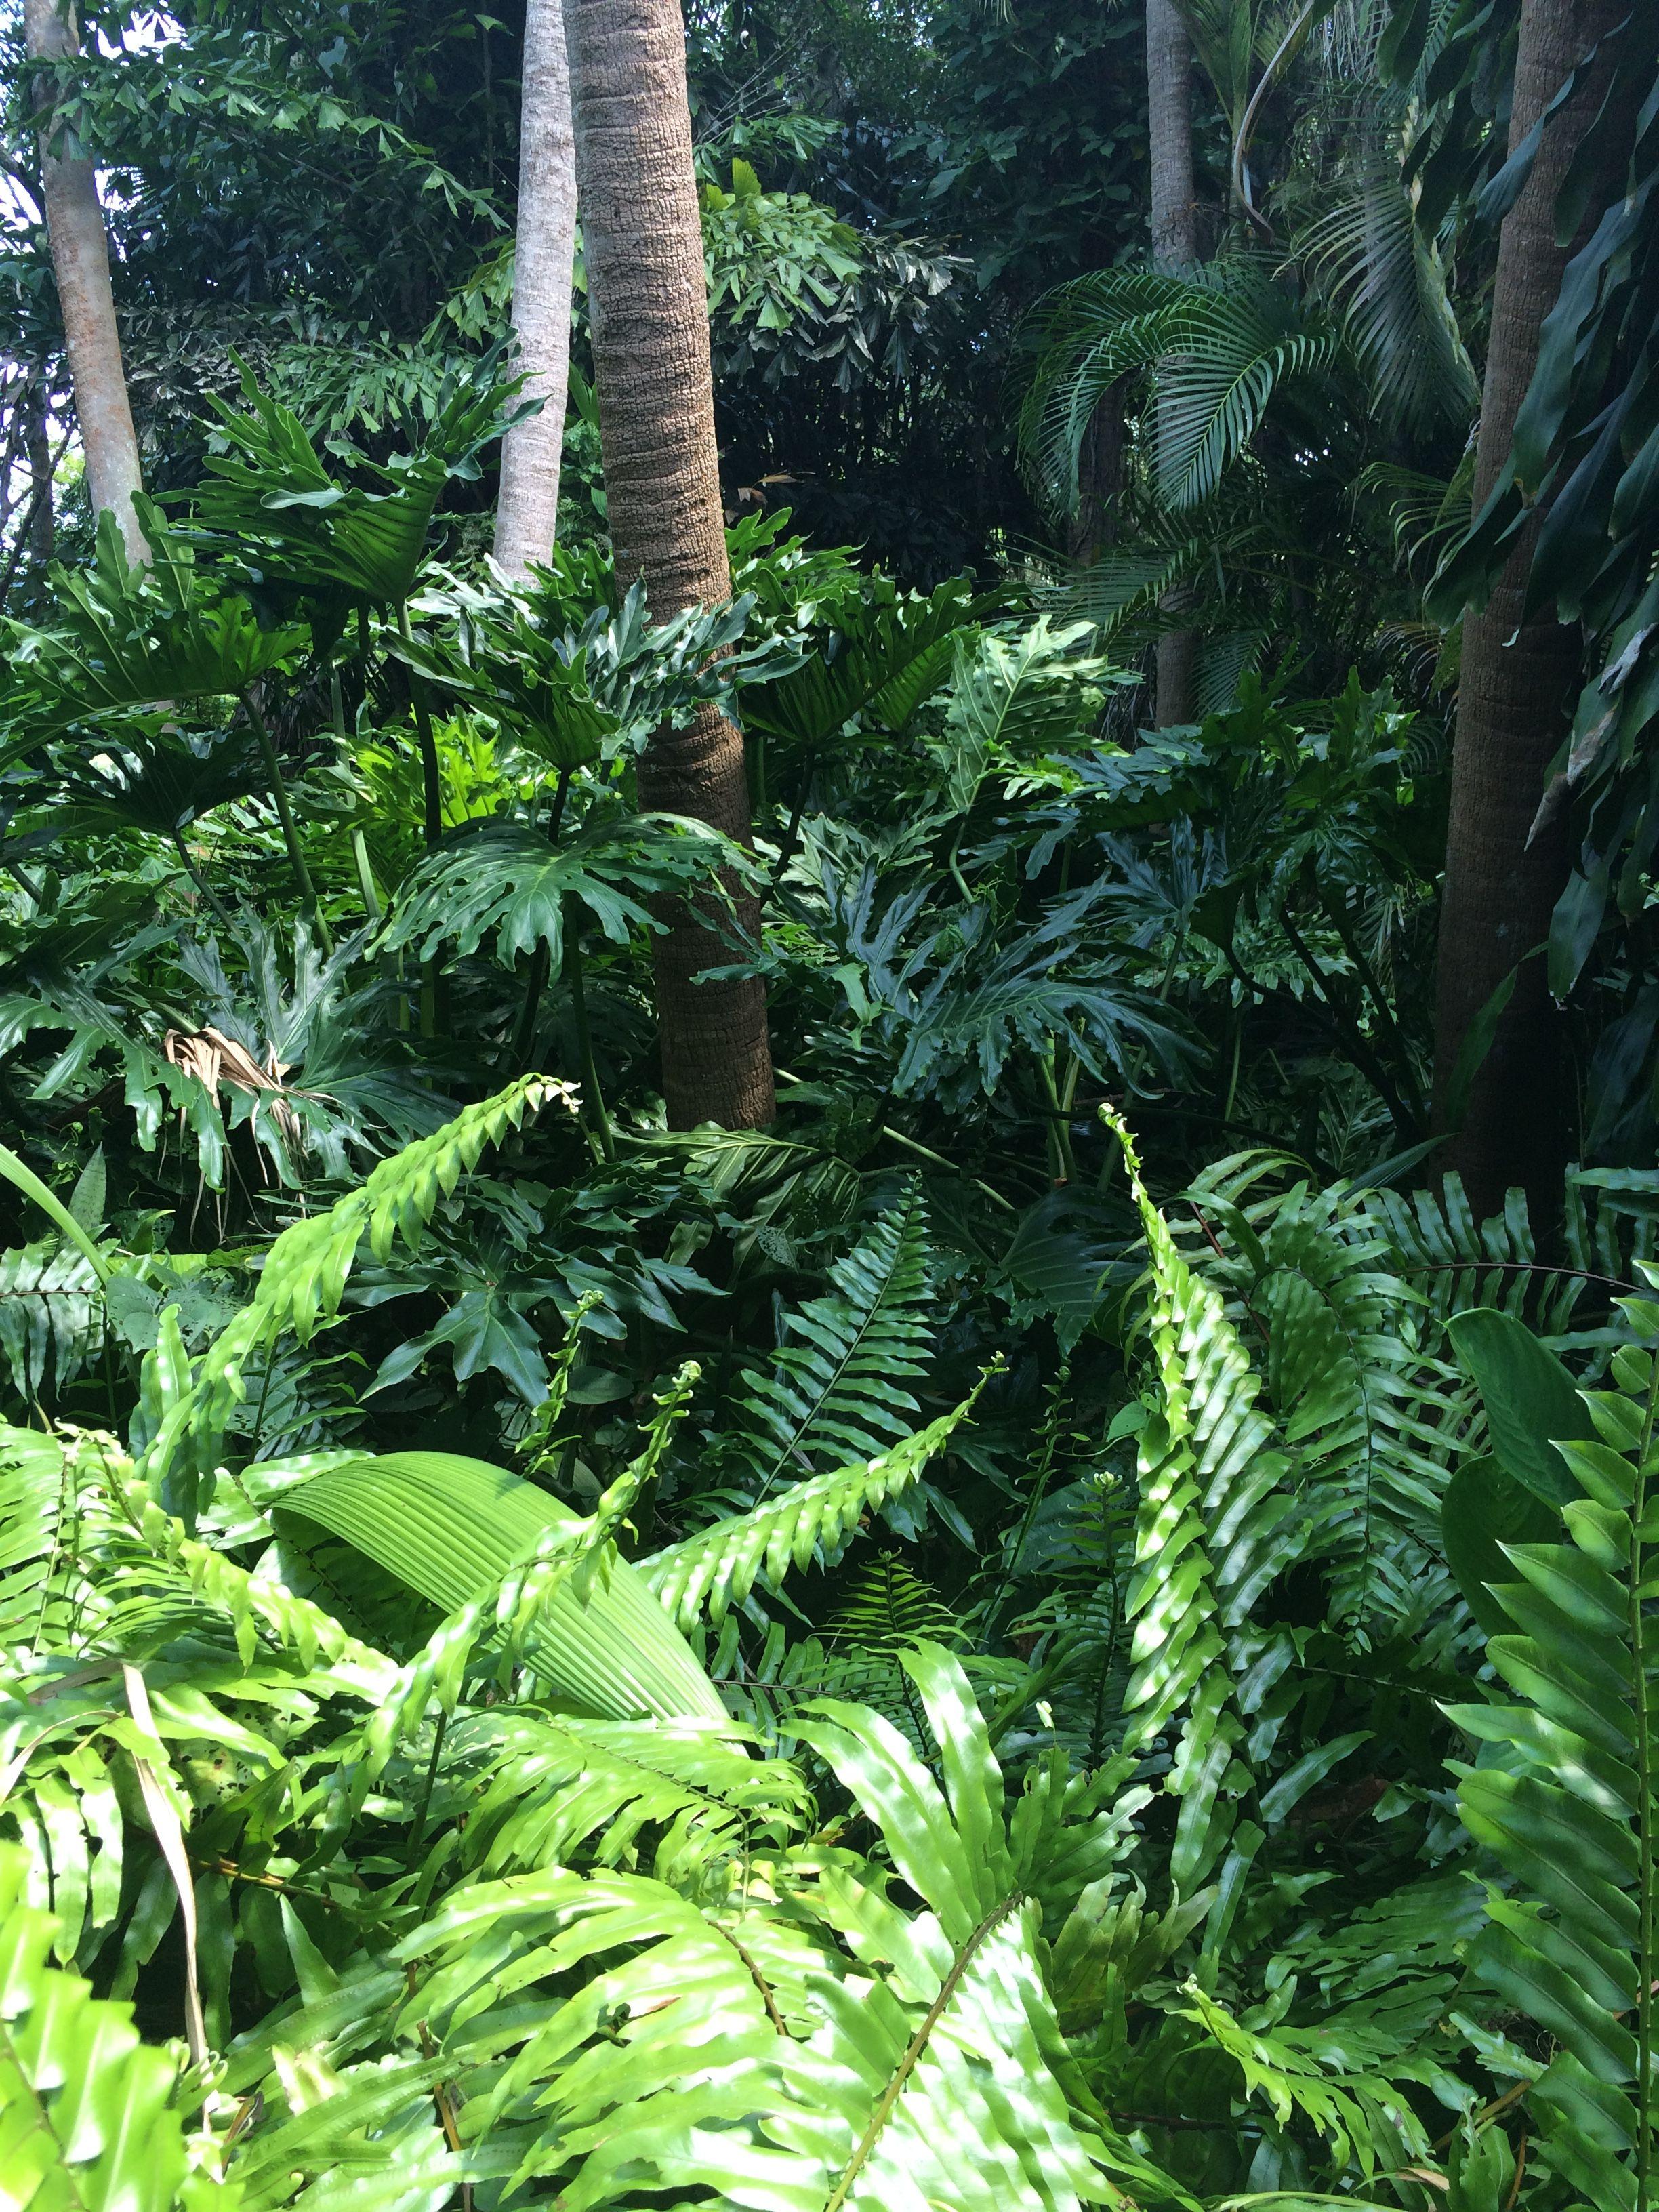 Dschungel badezimmer dekor legoland floridaus garden  photo by gabrielle vernier  enchanted